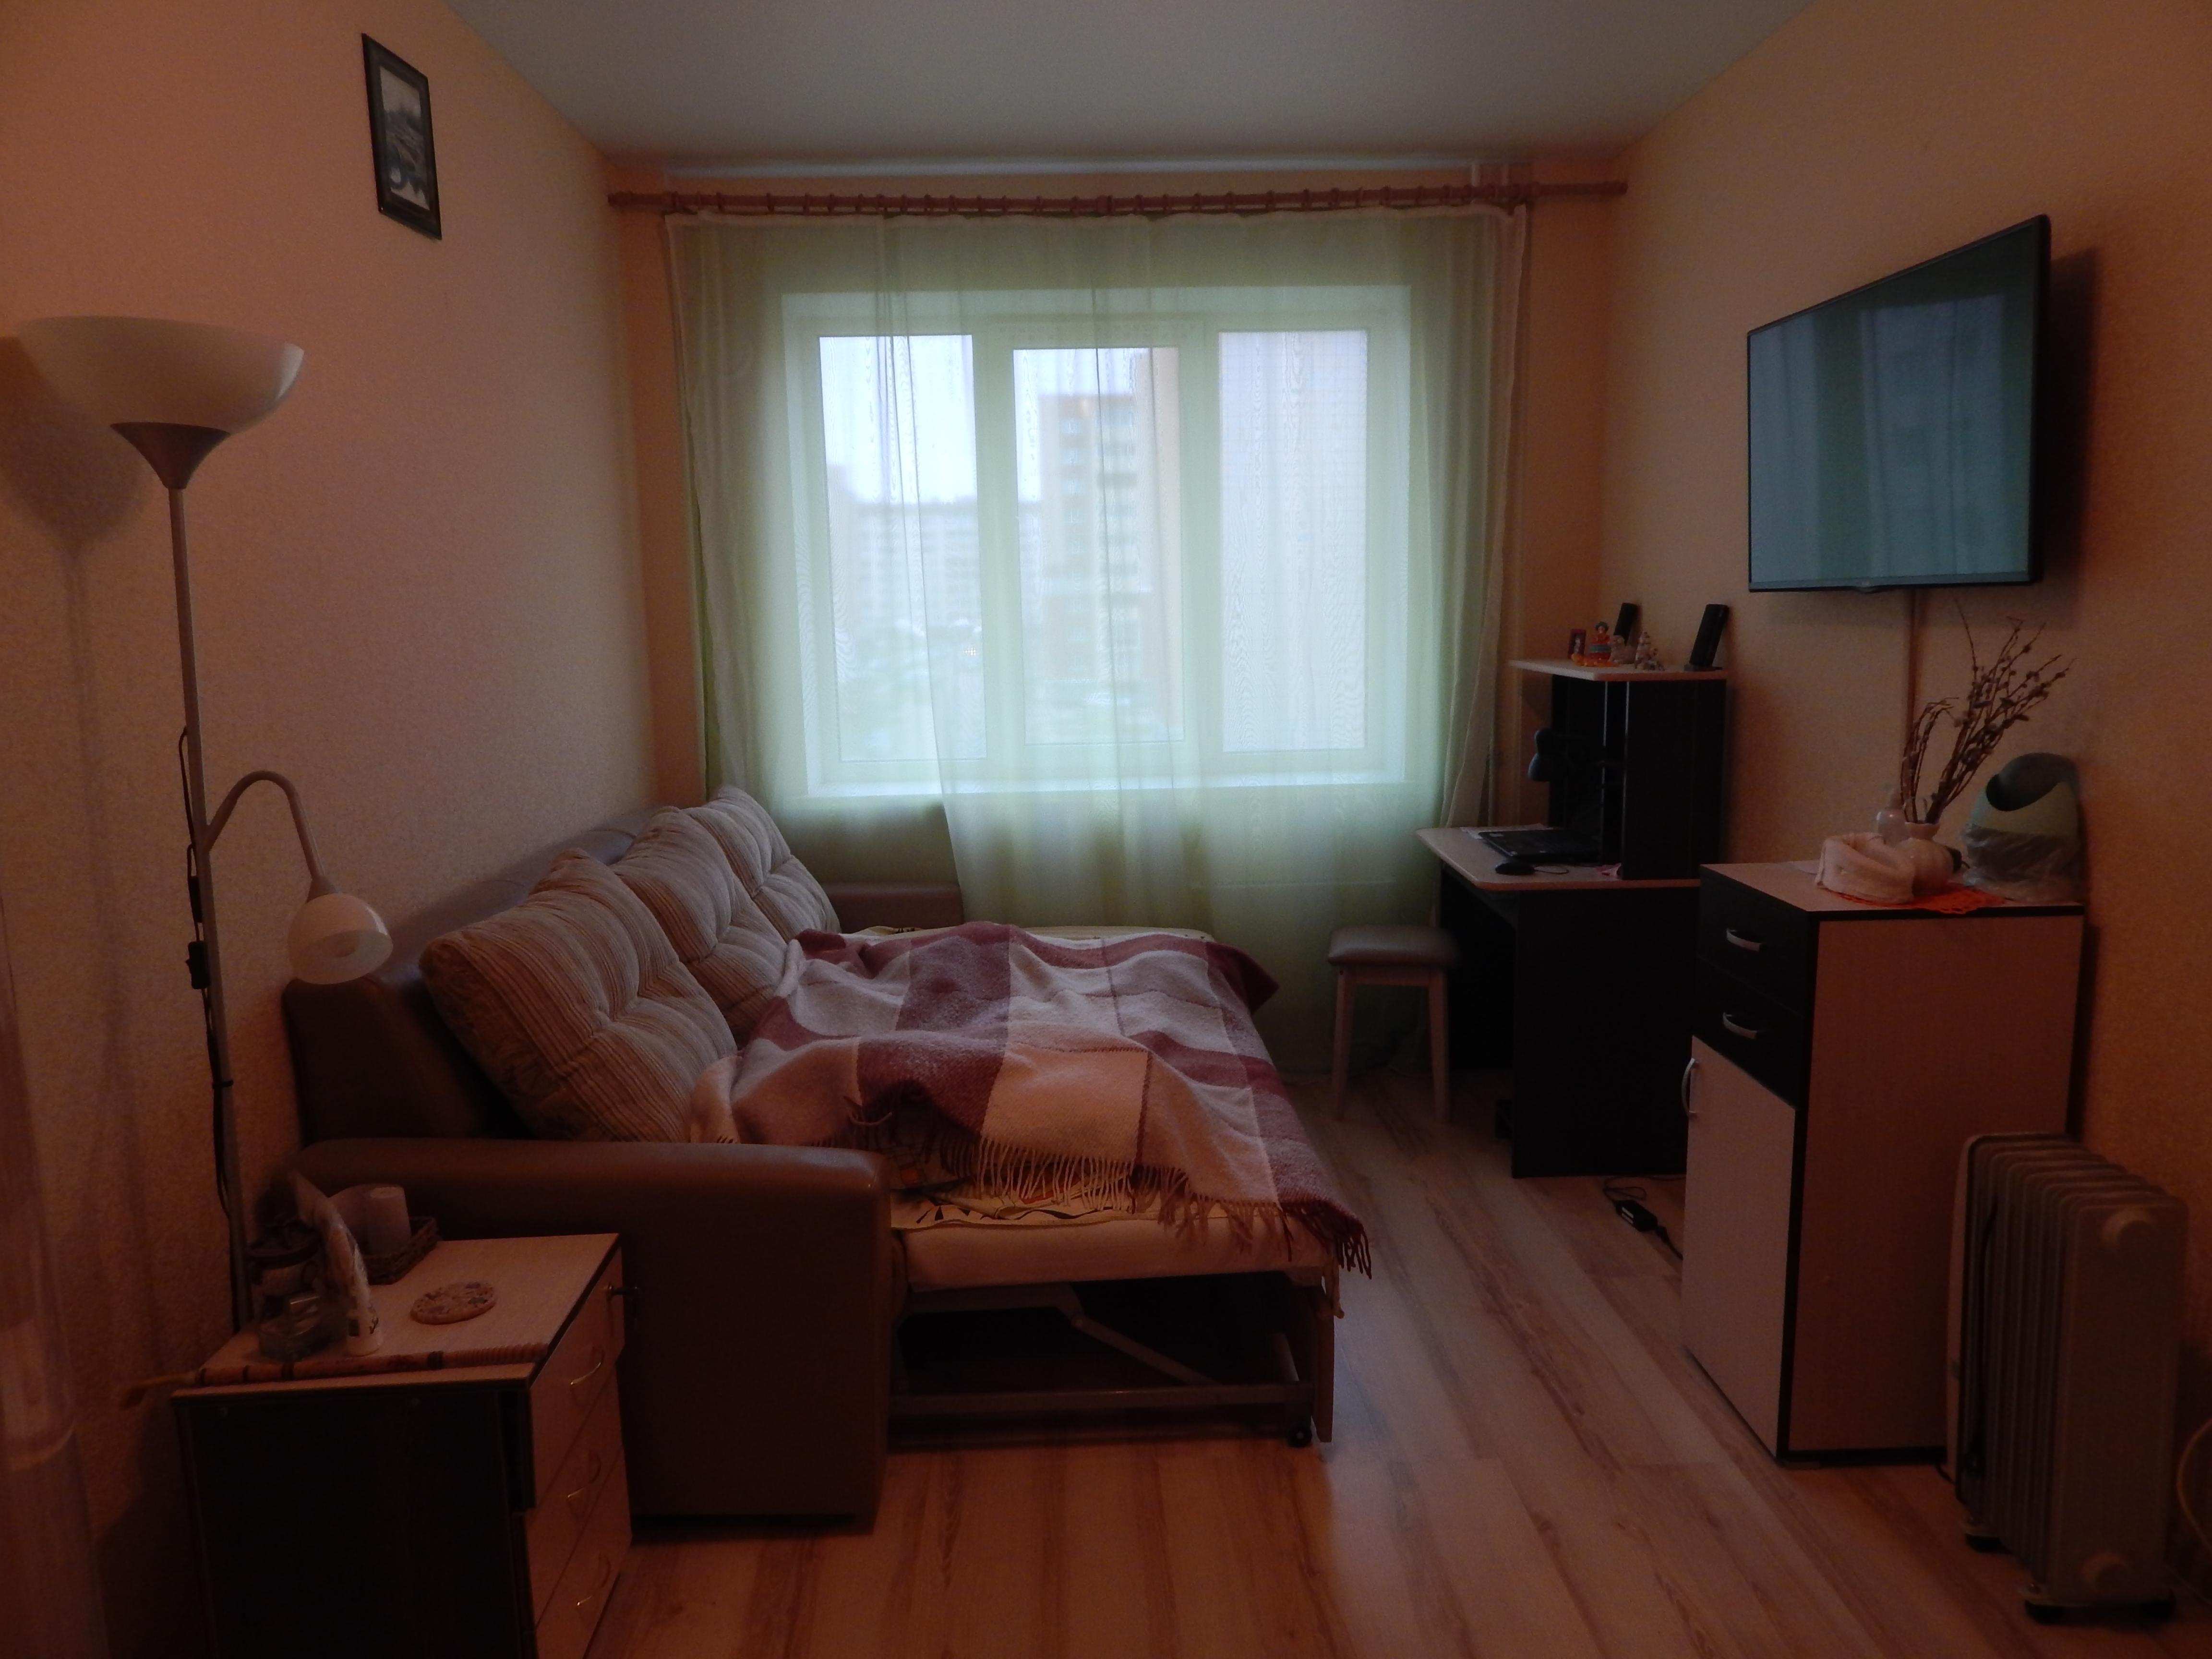 Однокомнатная квартира - ул.Балтийская, д. 10